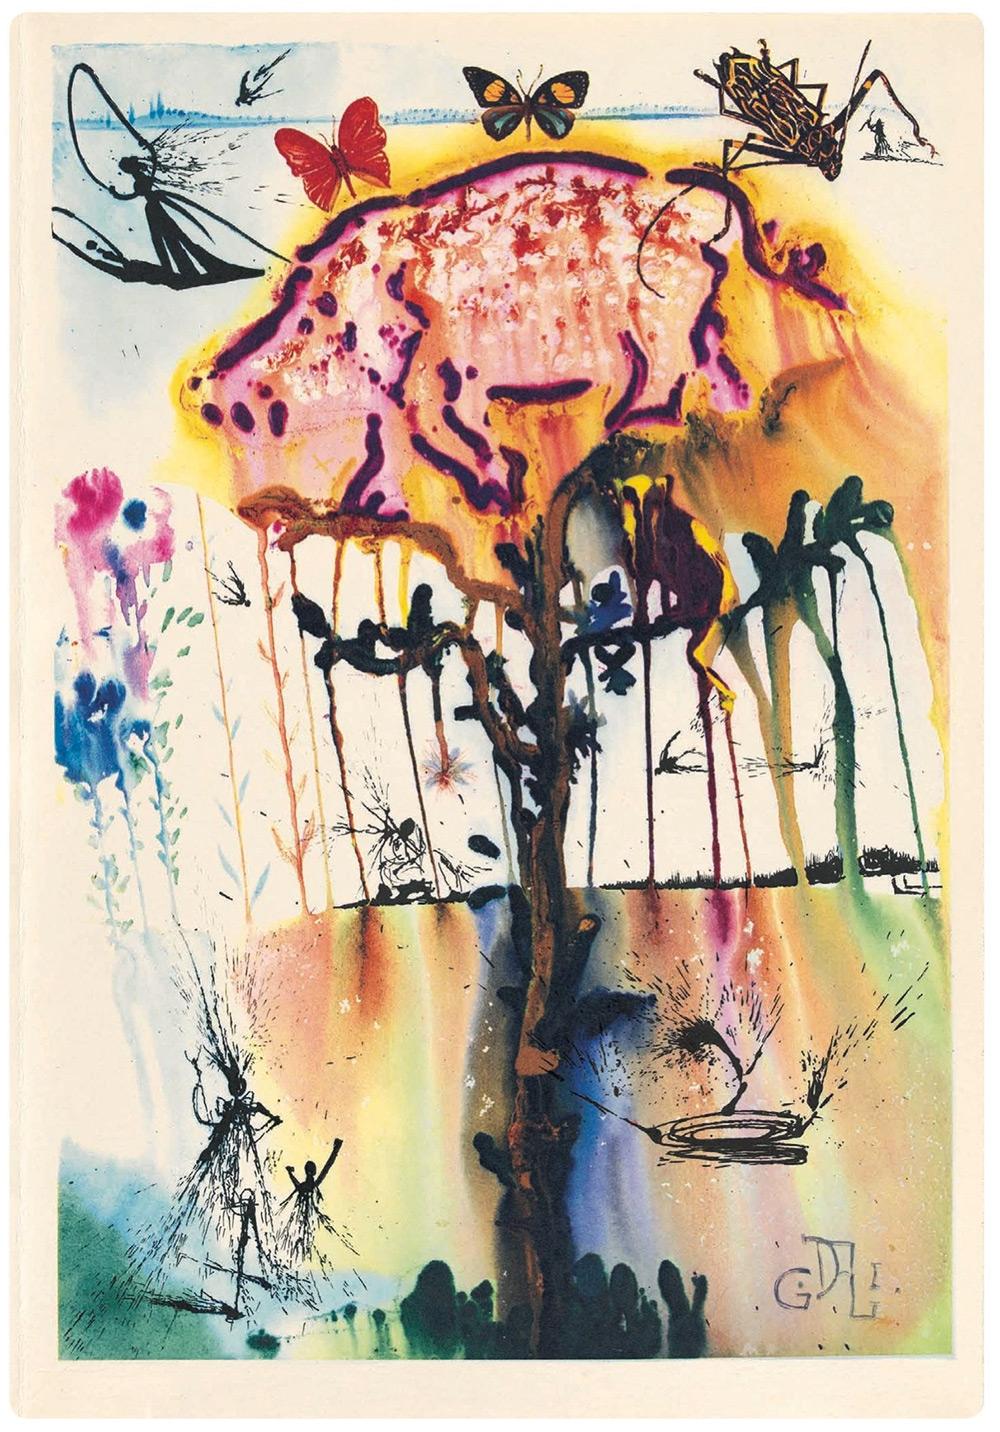 dali-alice-pays-merveille-livre-illustration-07